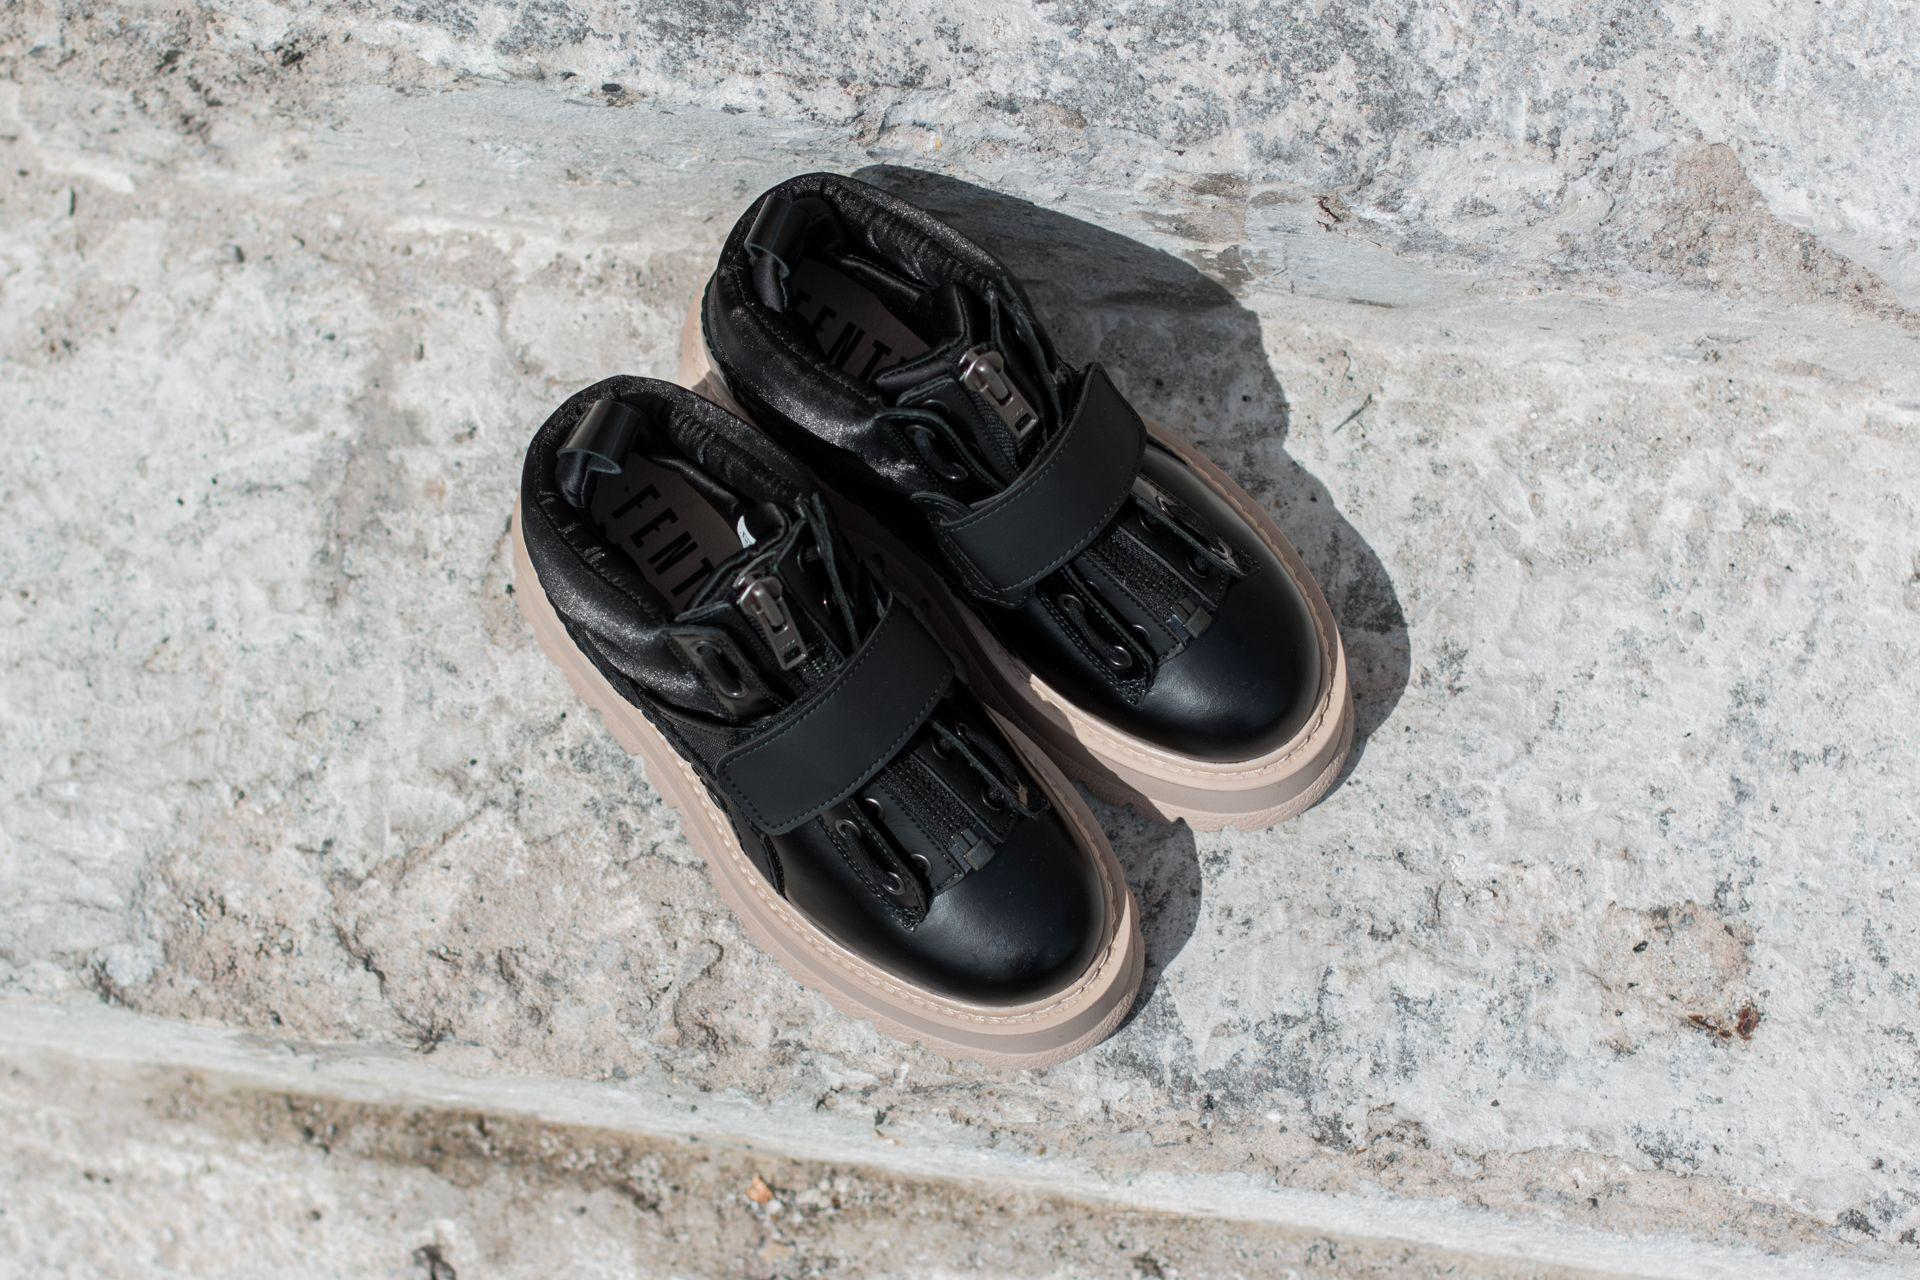 Fenty Sneaker Boot Strap Wns Black Black pink Tint